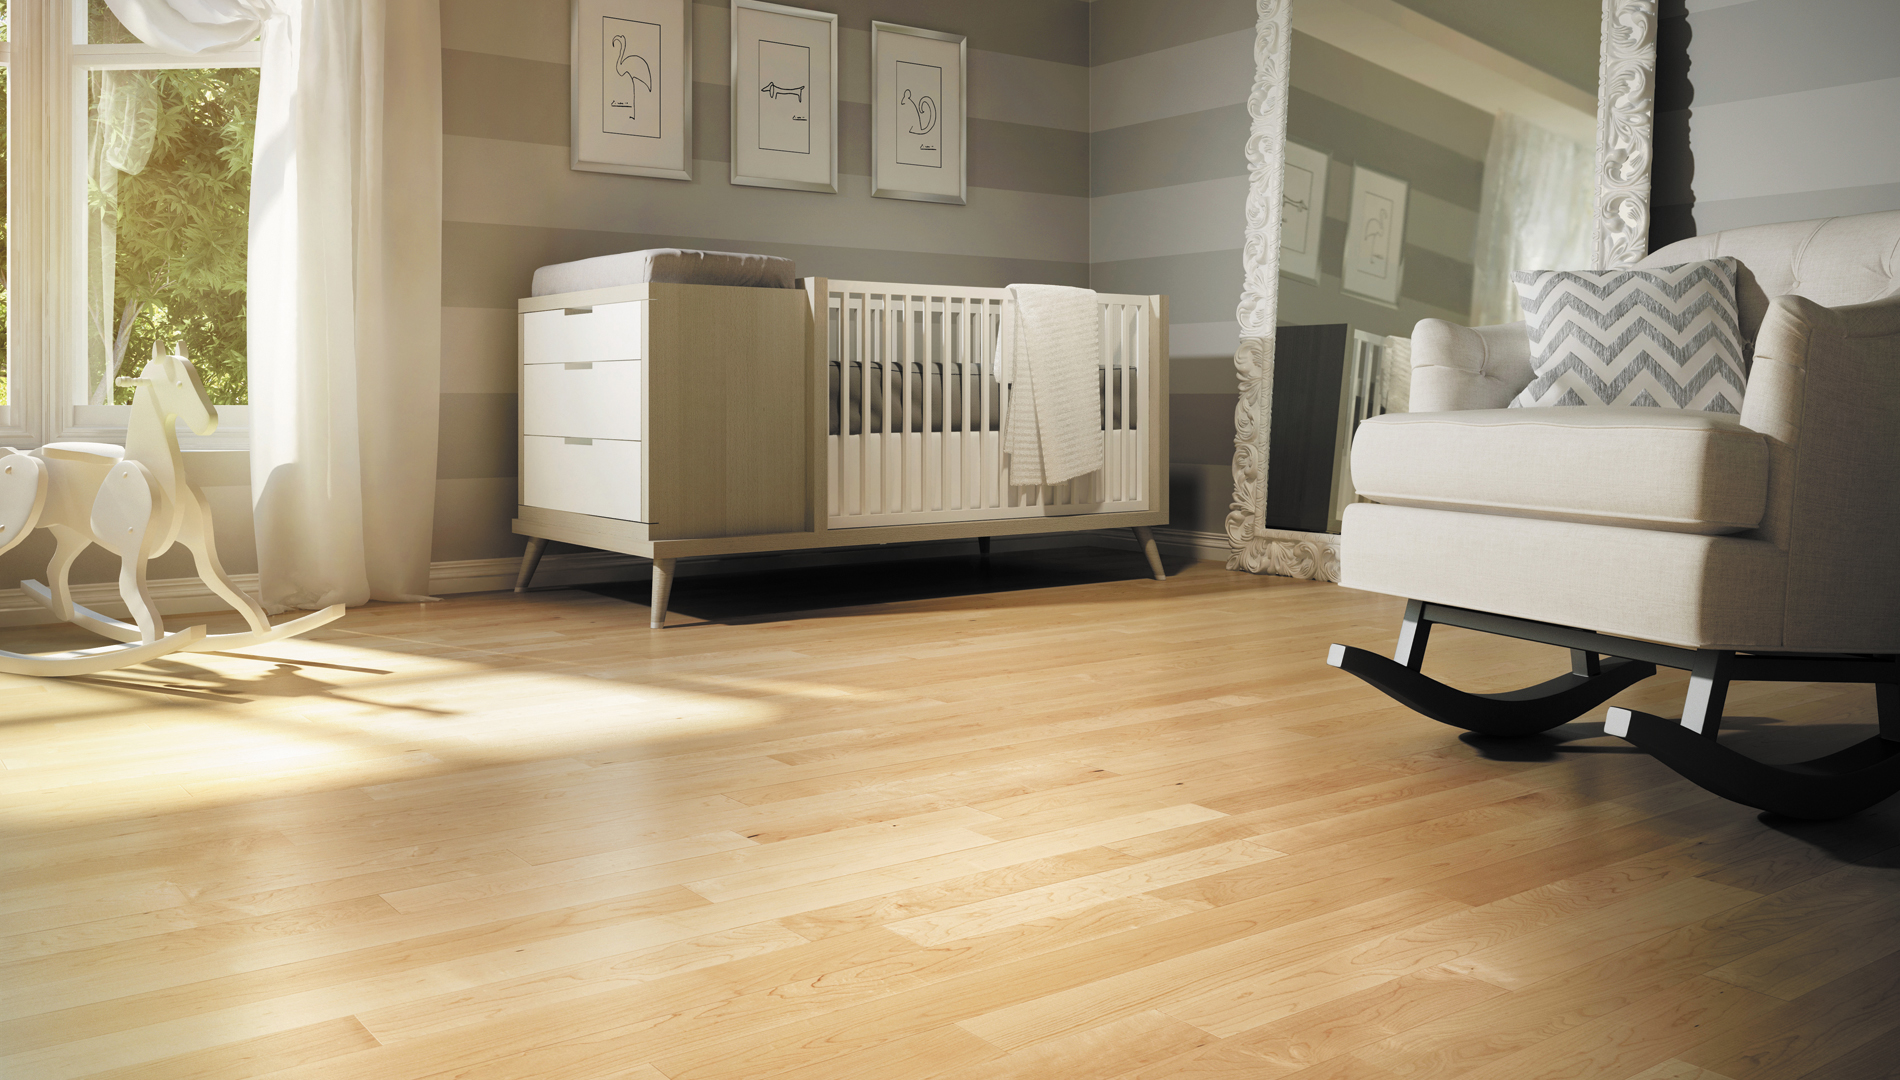 bedroom-hard-maple-hardwood-flooring-natural-select-better-natural-ambiance-lauzon (1).jpg